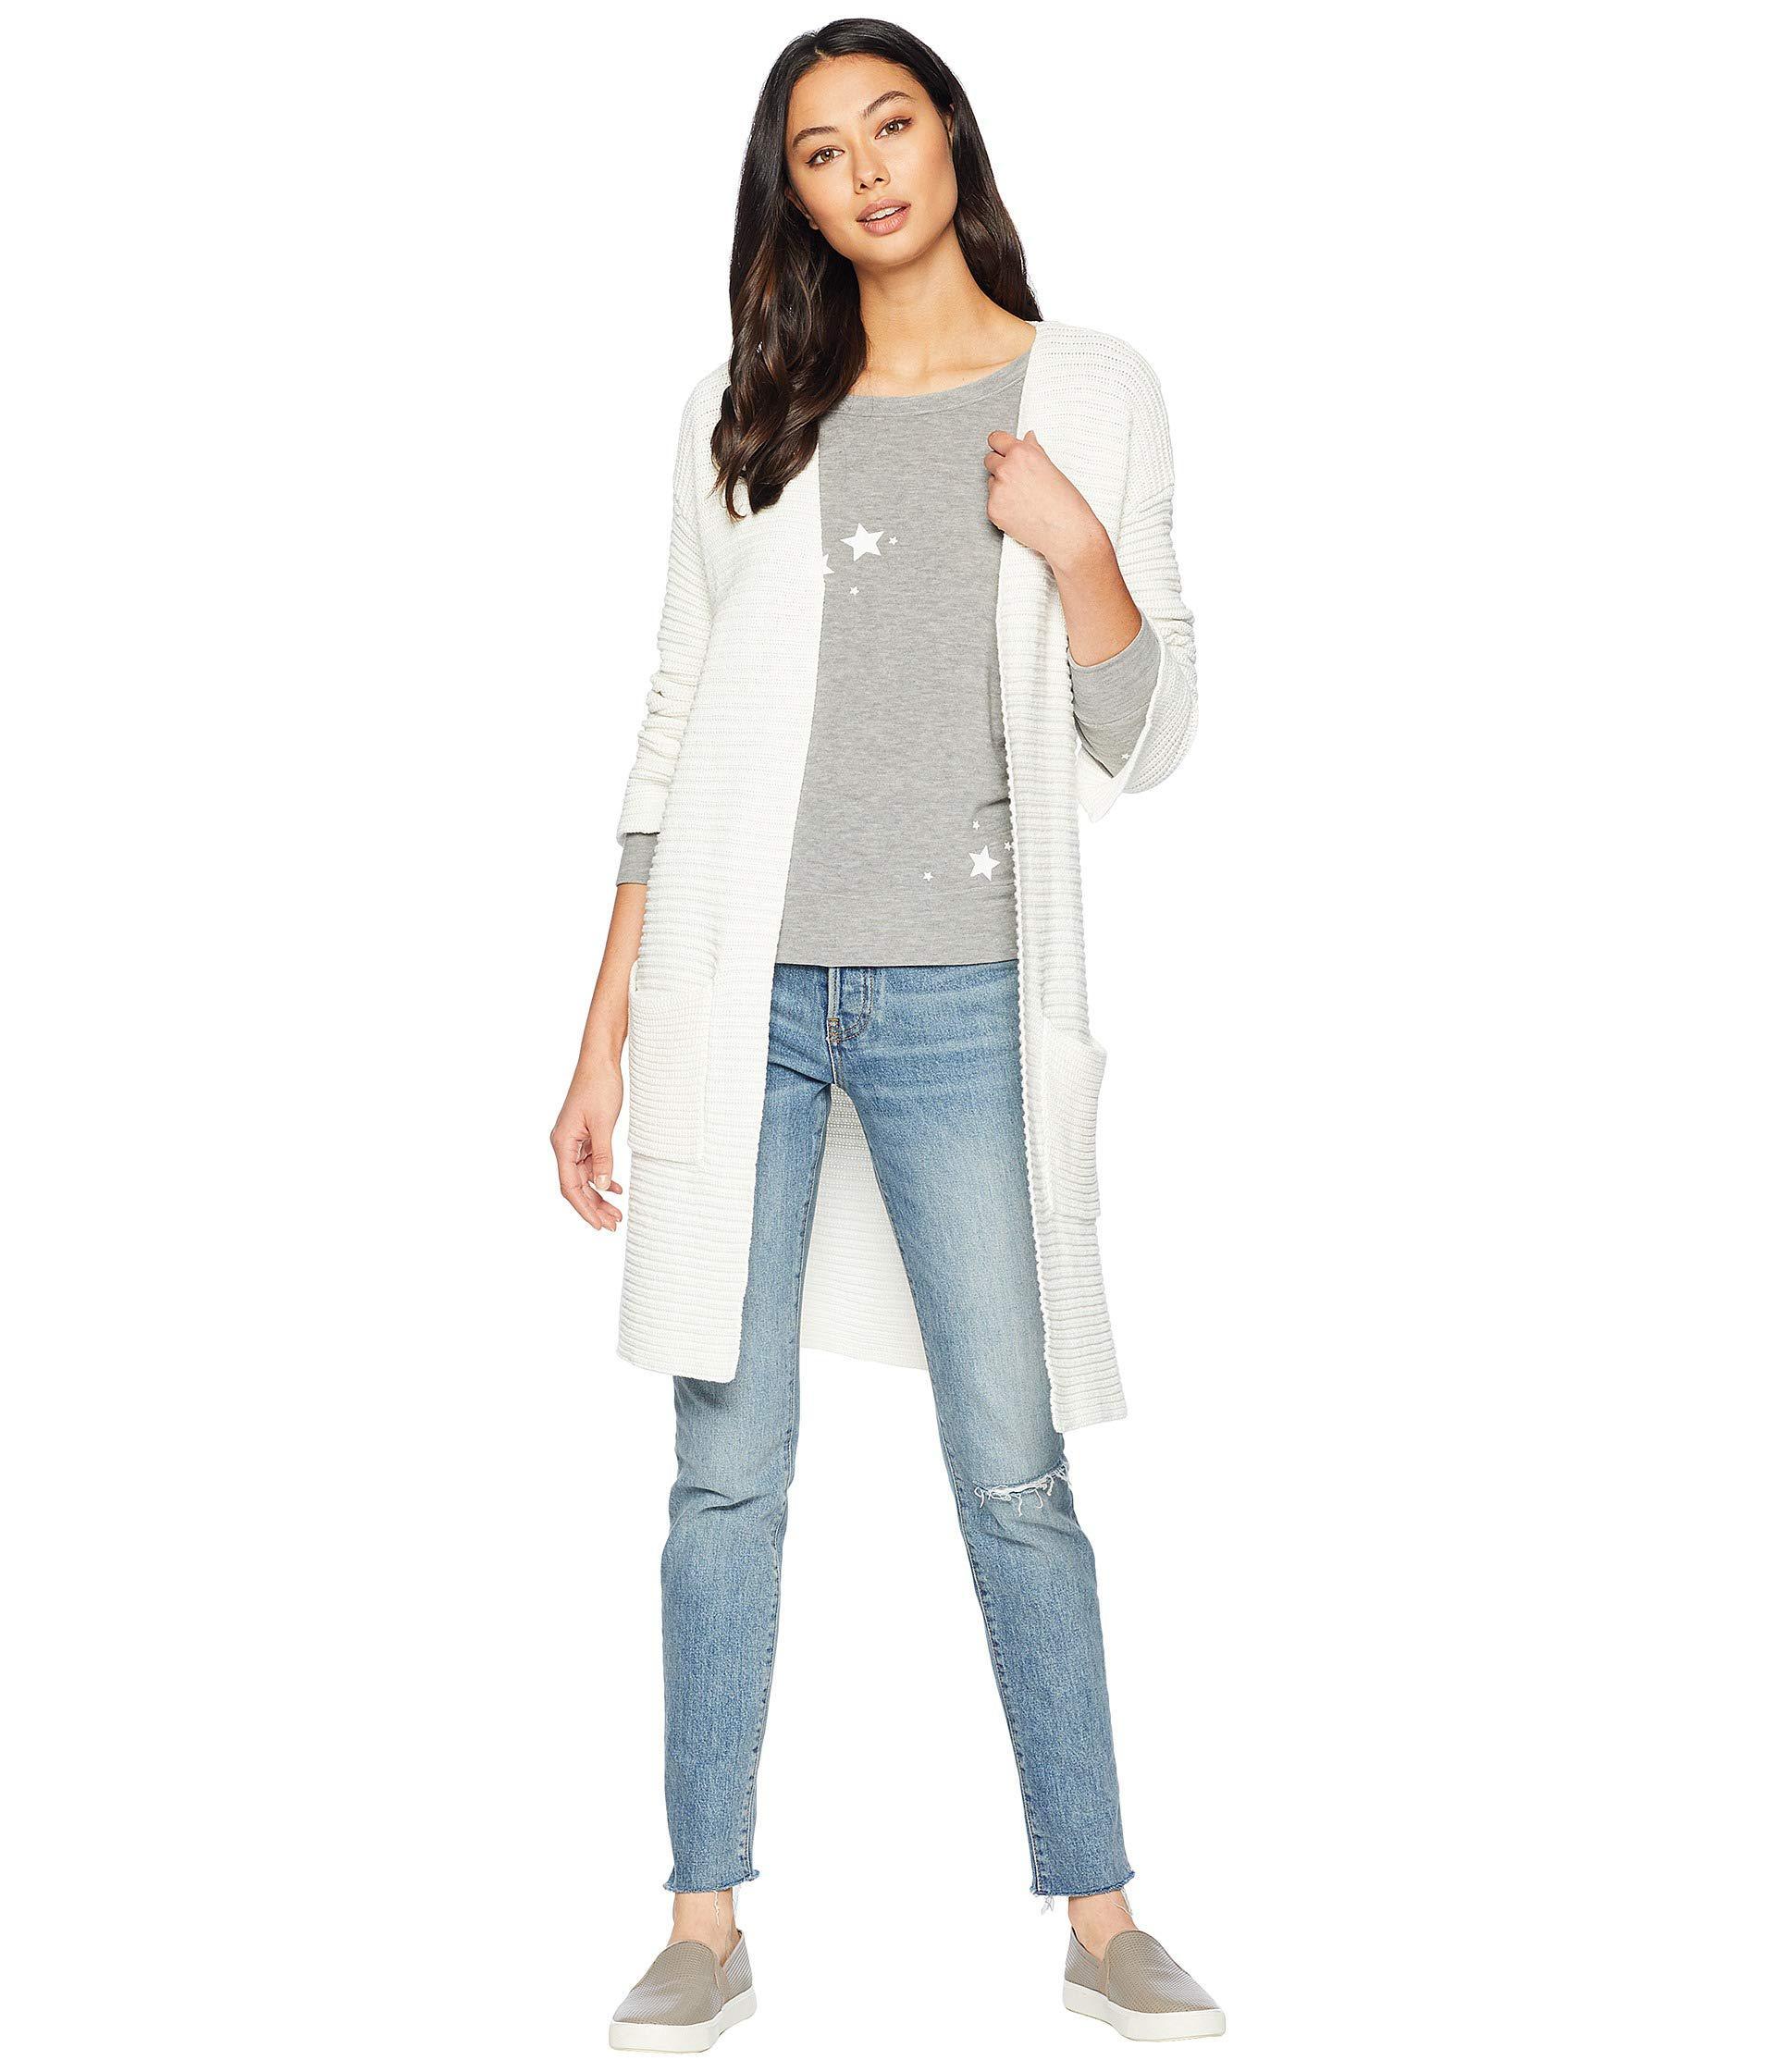 5aa2aad8061 Kensie. White Cotton Tube Yarn Cardigan Ks0k5822 (ivory cloud) Women s  Sweater